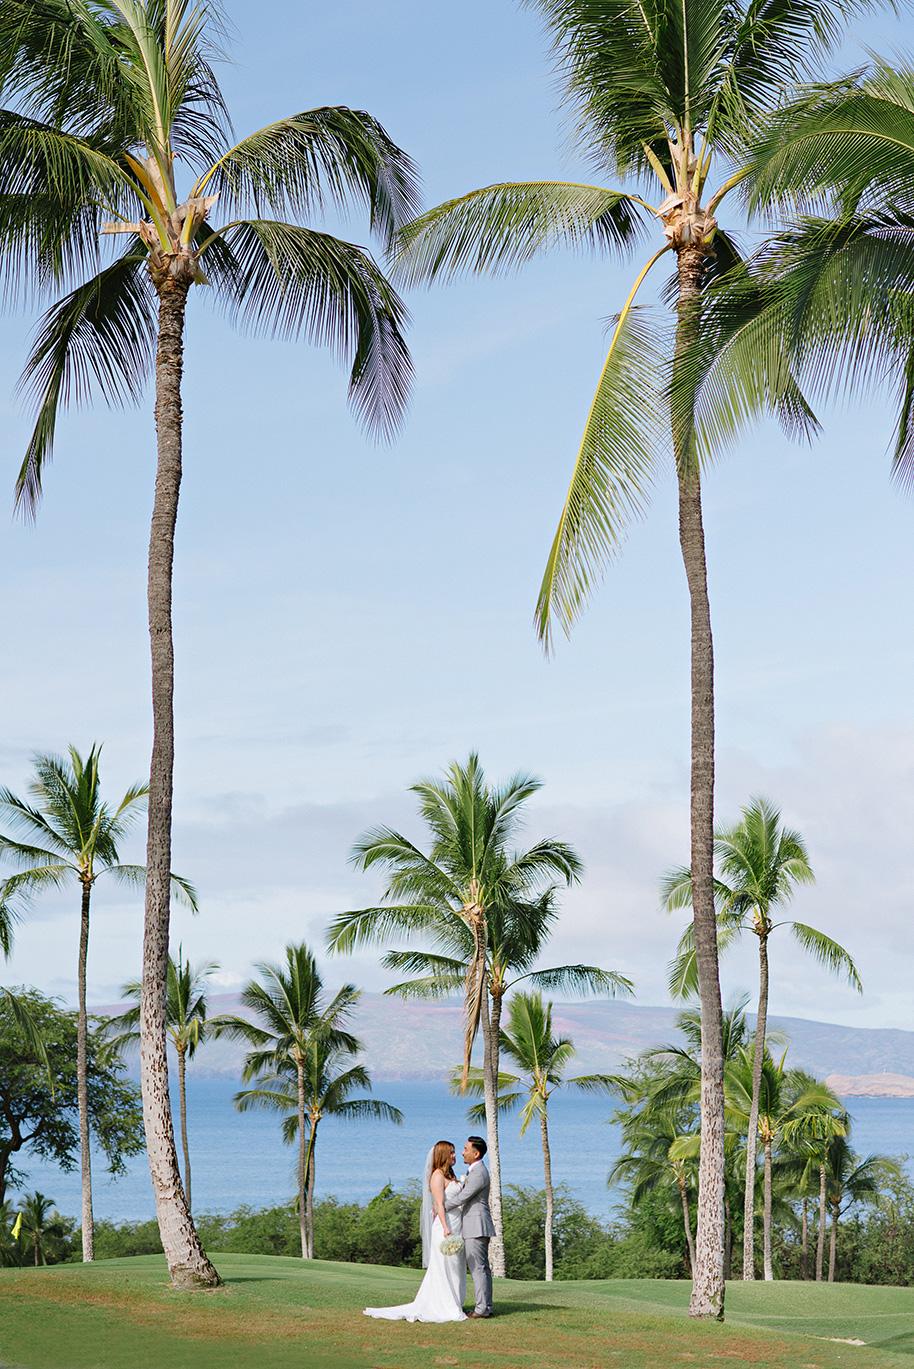 Maui-Wedding-052416-20